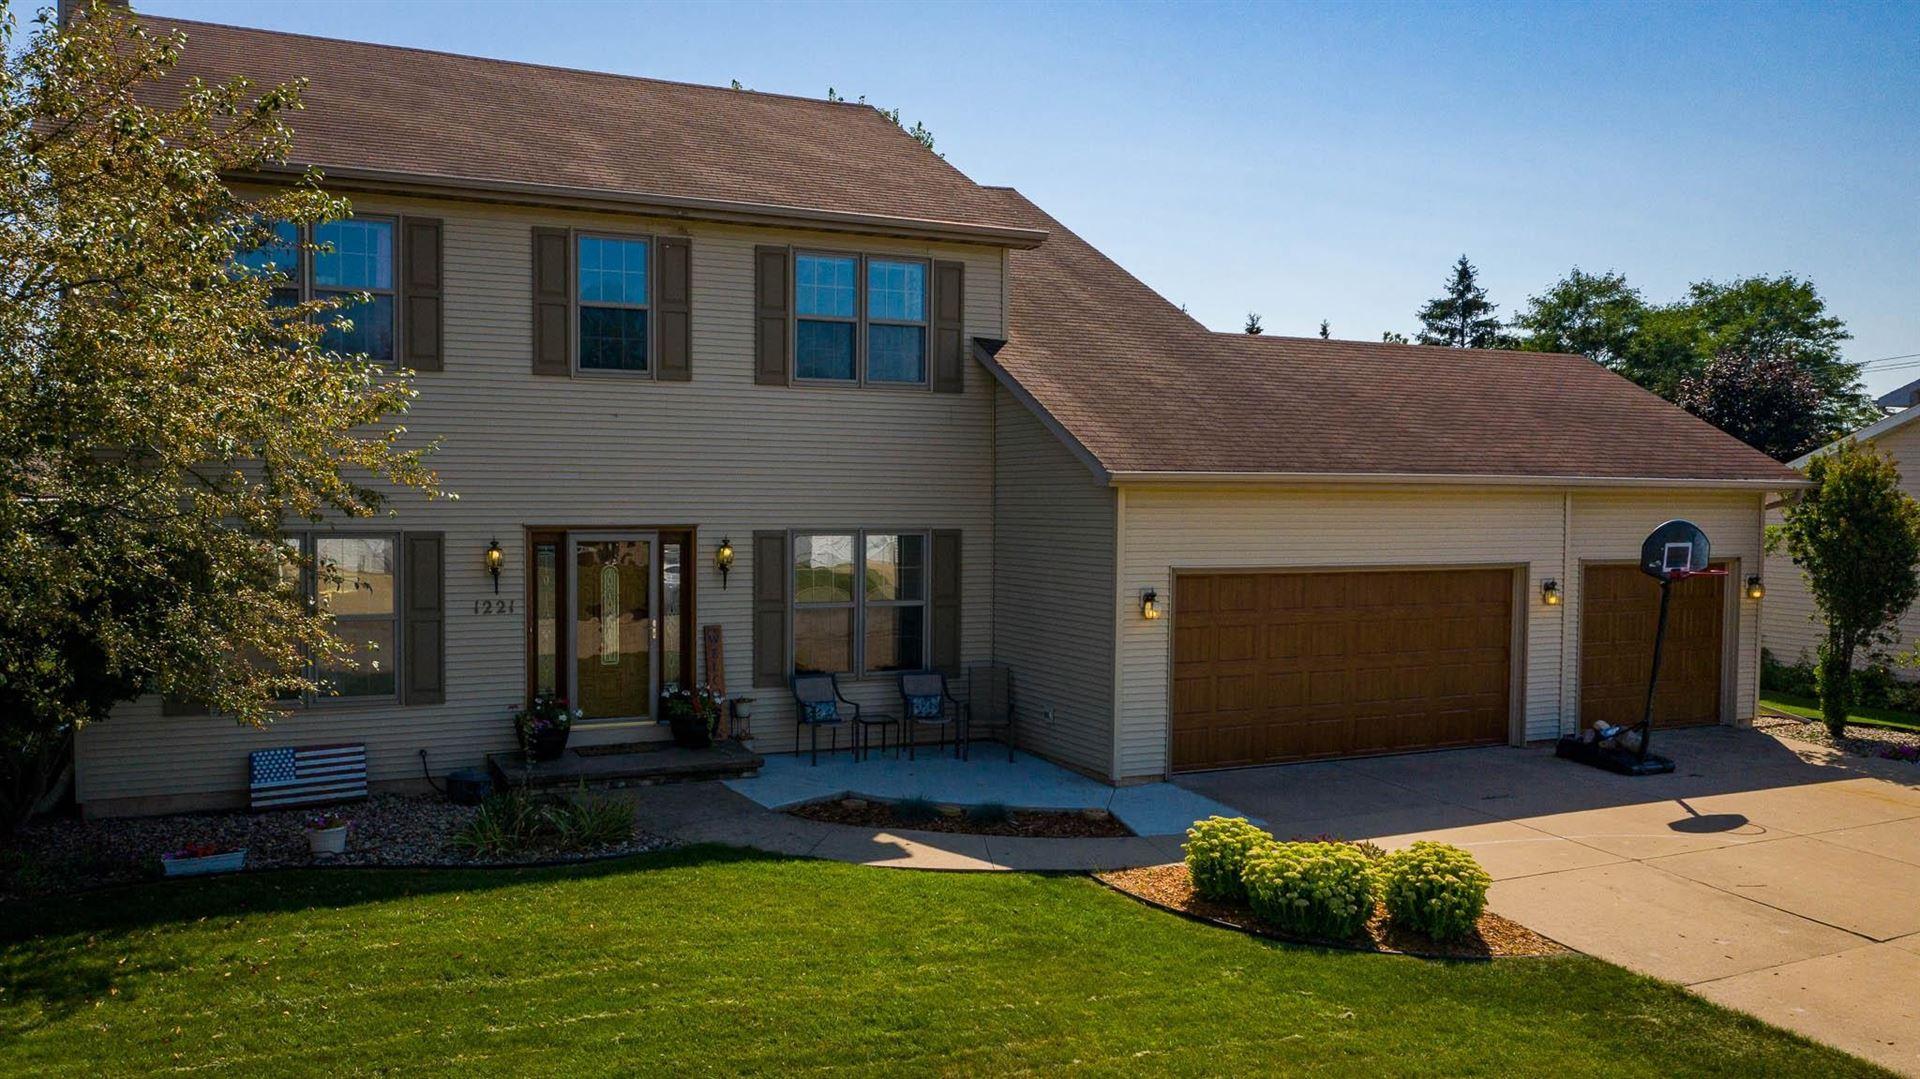 1221 W WOODSTONE Drive, Appleton, WI 54914 - MLS#: 50246647